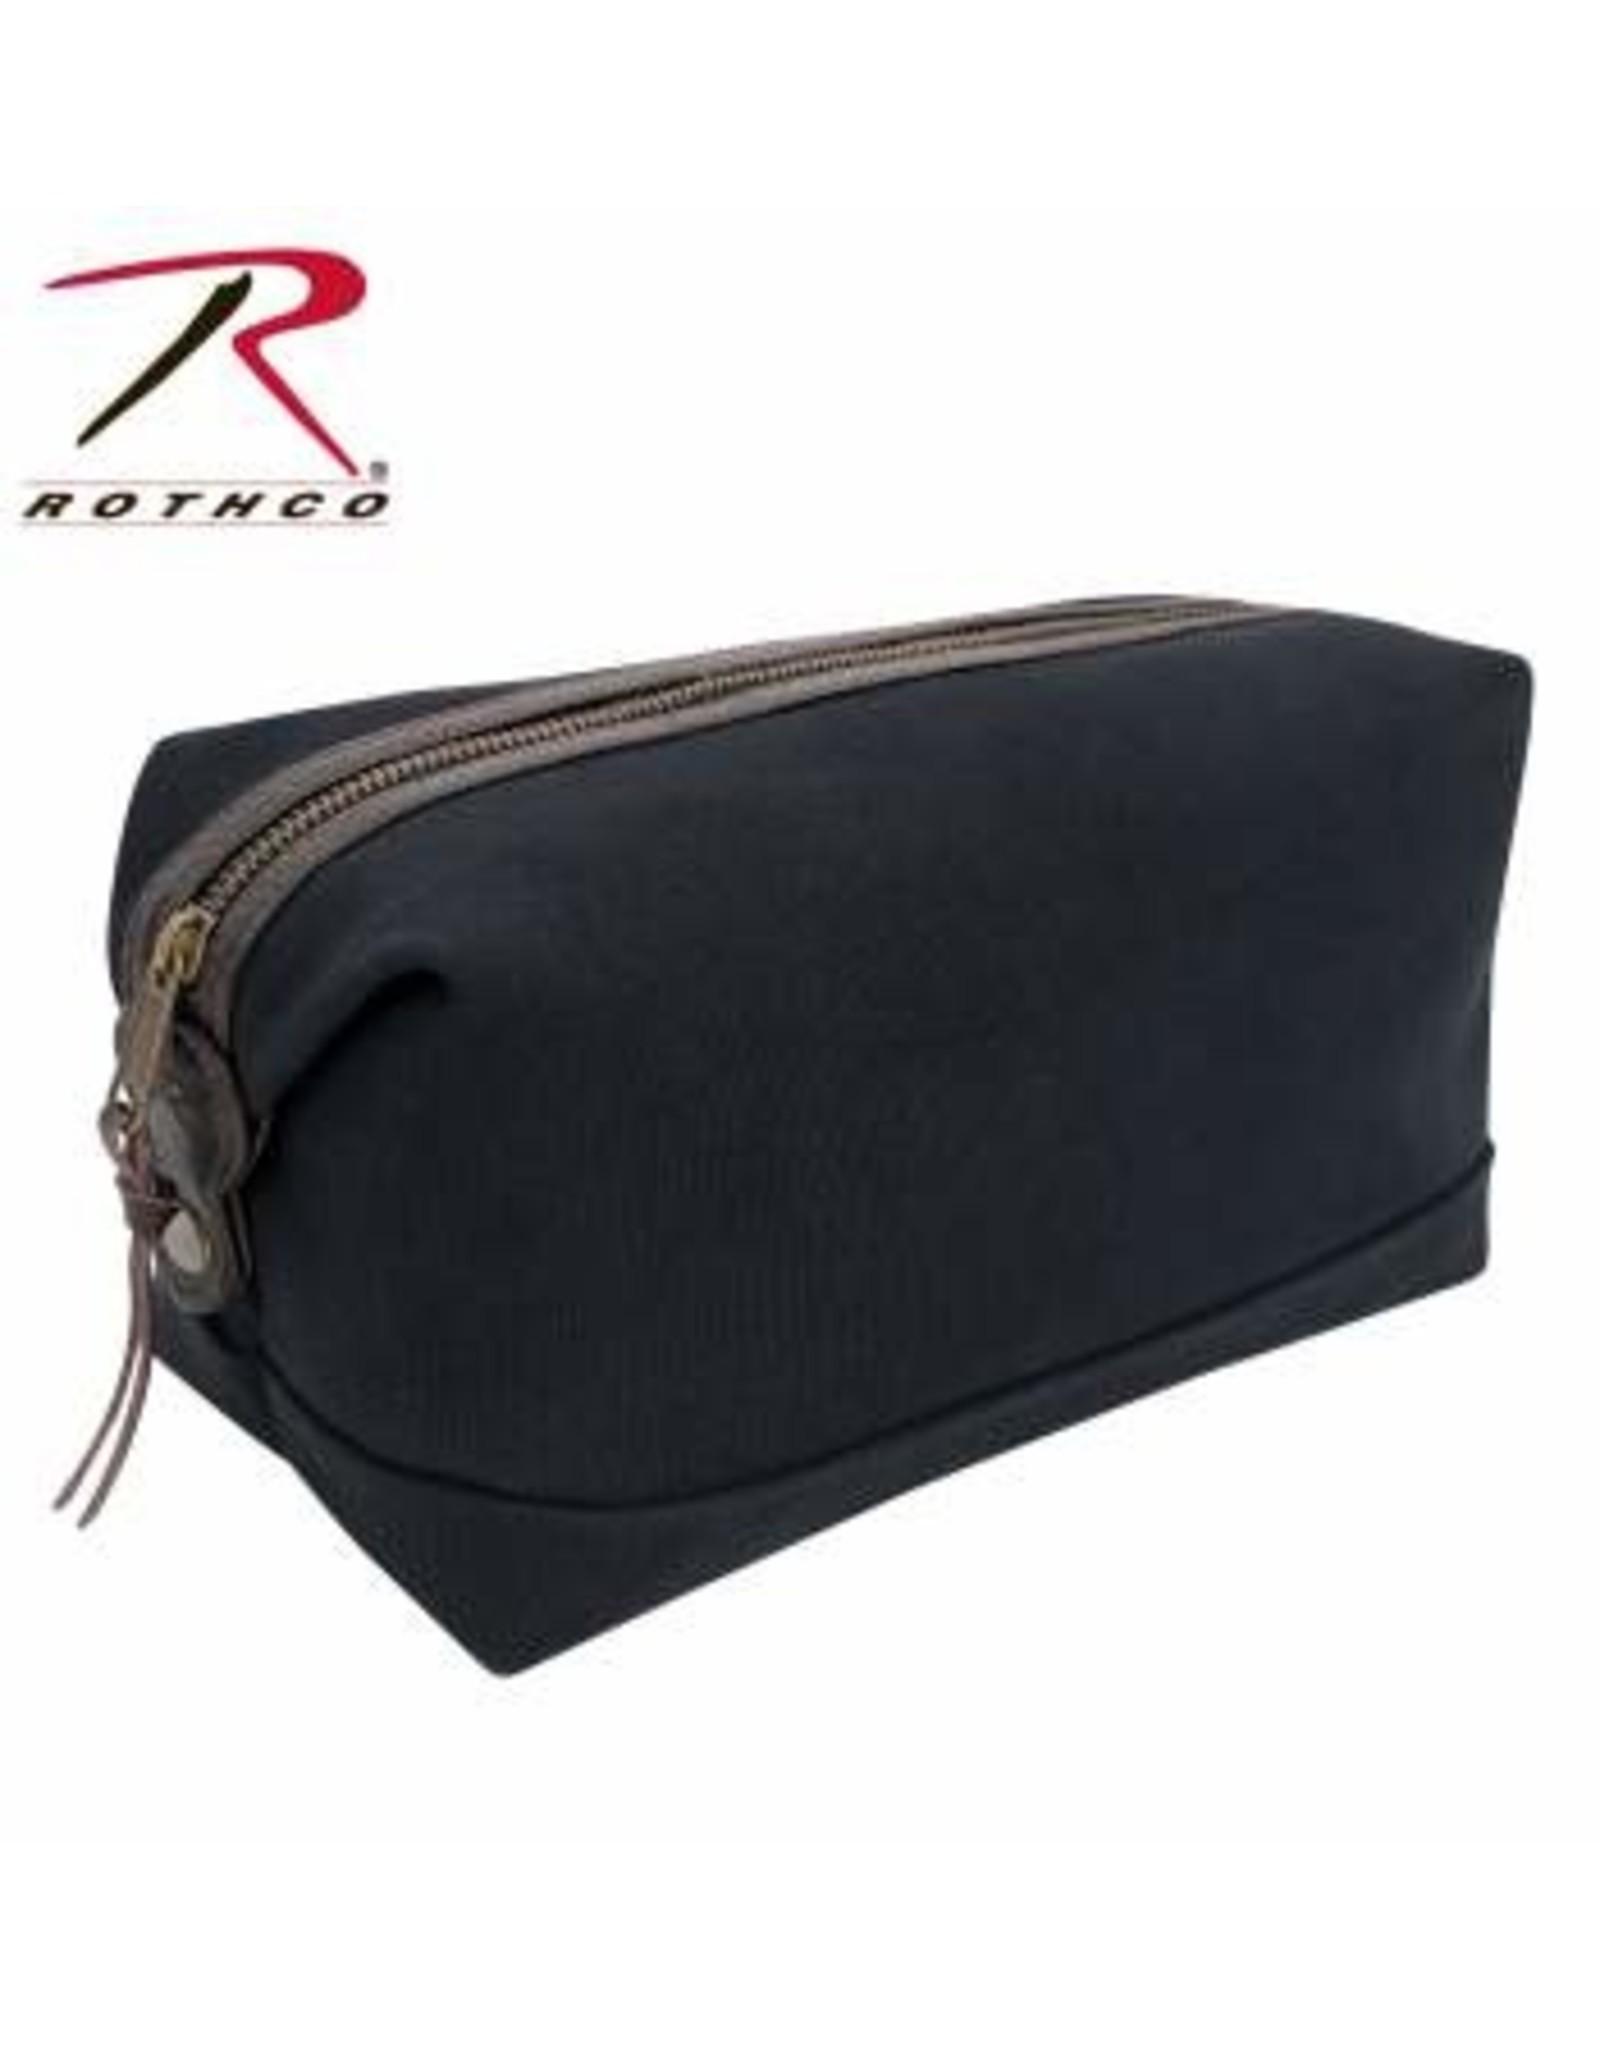 ROTHCO Rothco Canvas & Leather Travel Kit